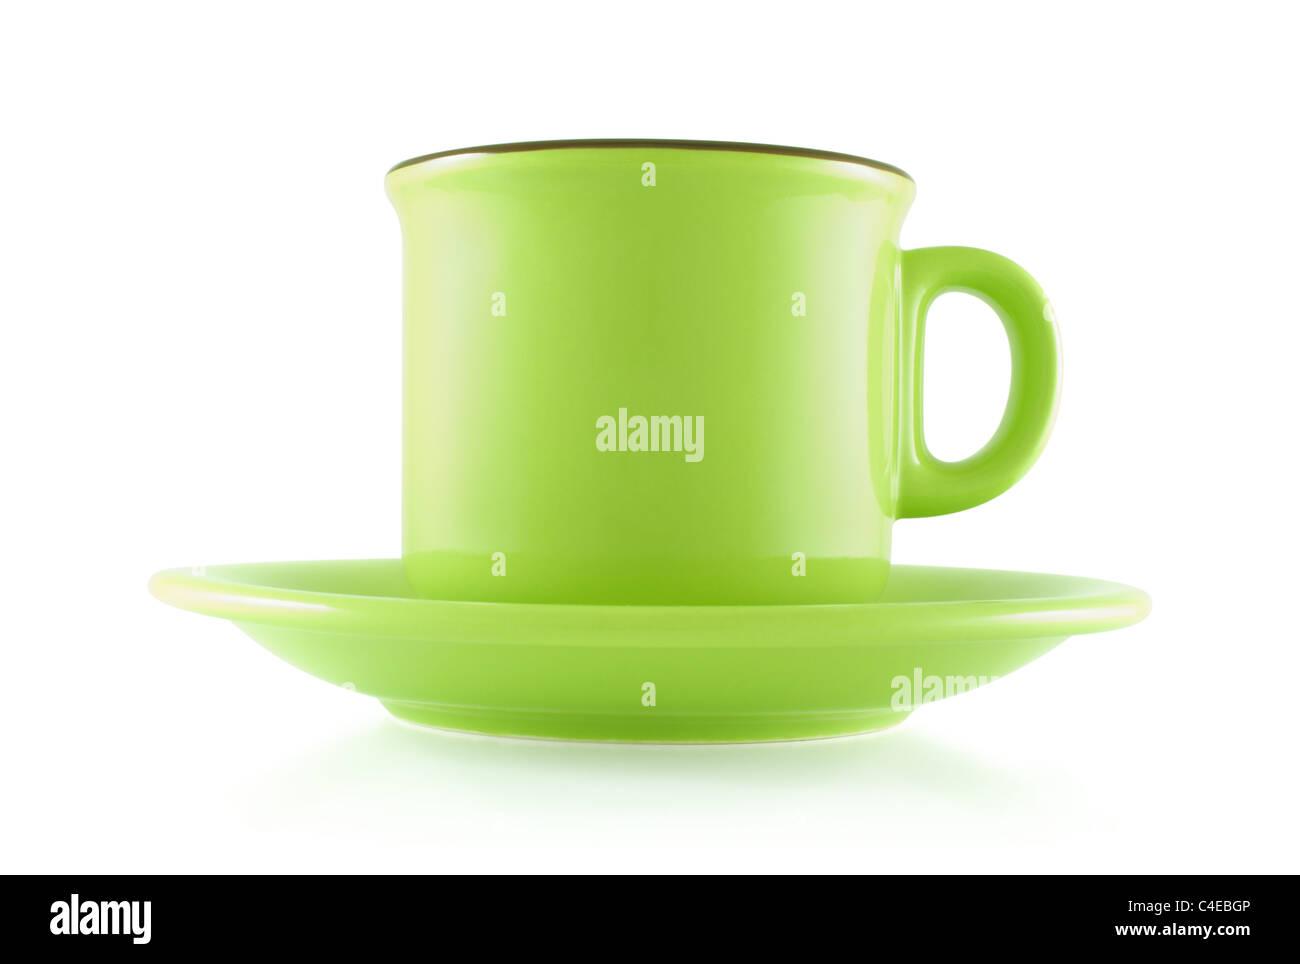 Tea coffee cup su sfondo bianco Immagini Stock